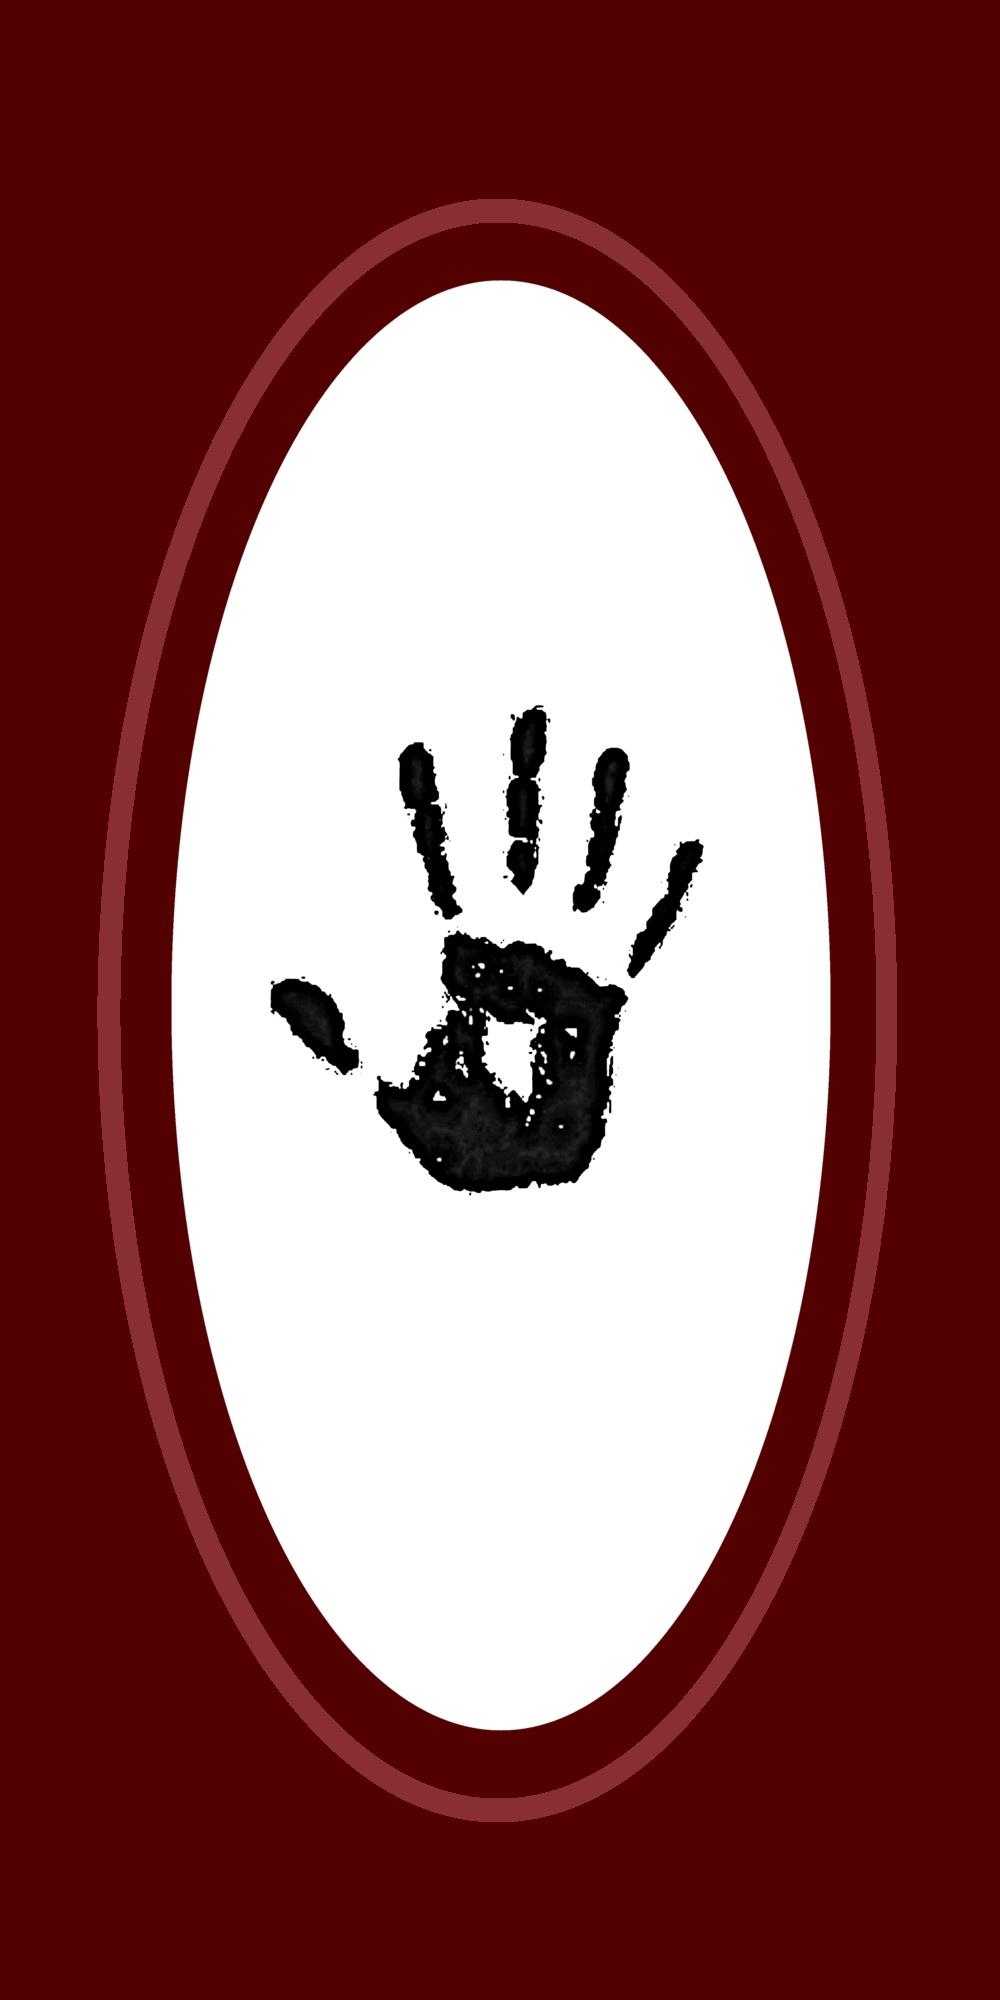 Dark Brotherhood Villains Wiki Fandom Powered By Wikia